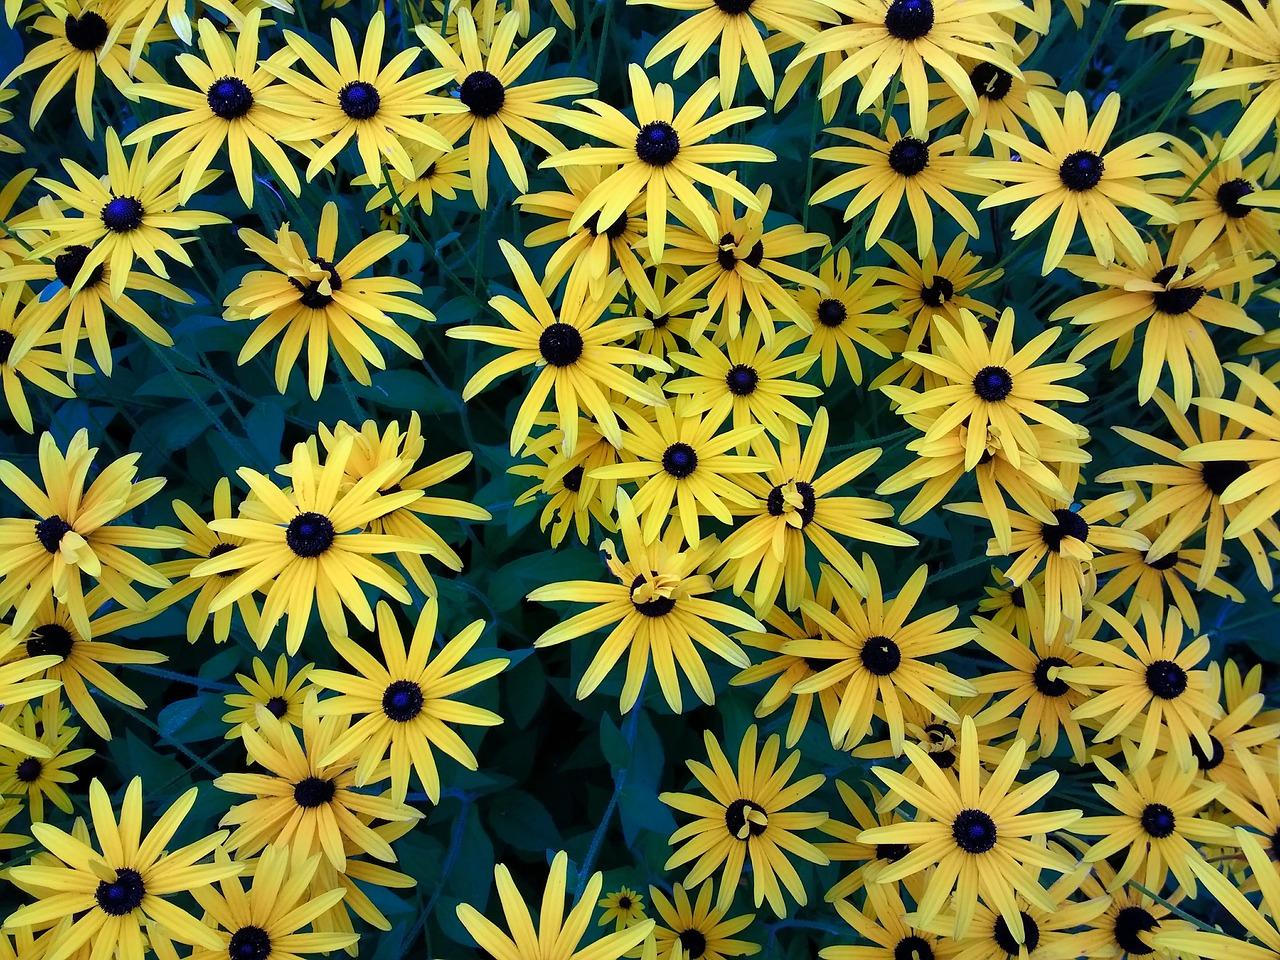 Flowersyellowplantpnature Free Photo From Needpix